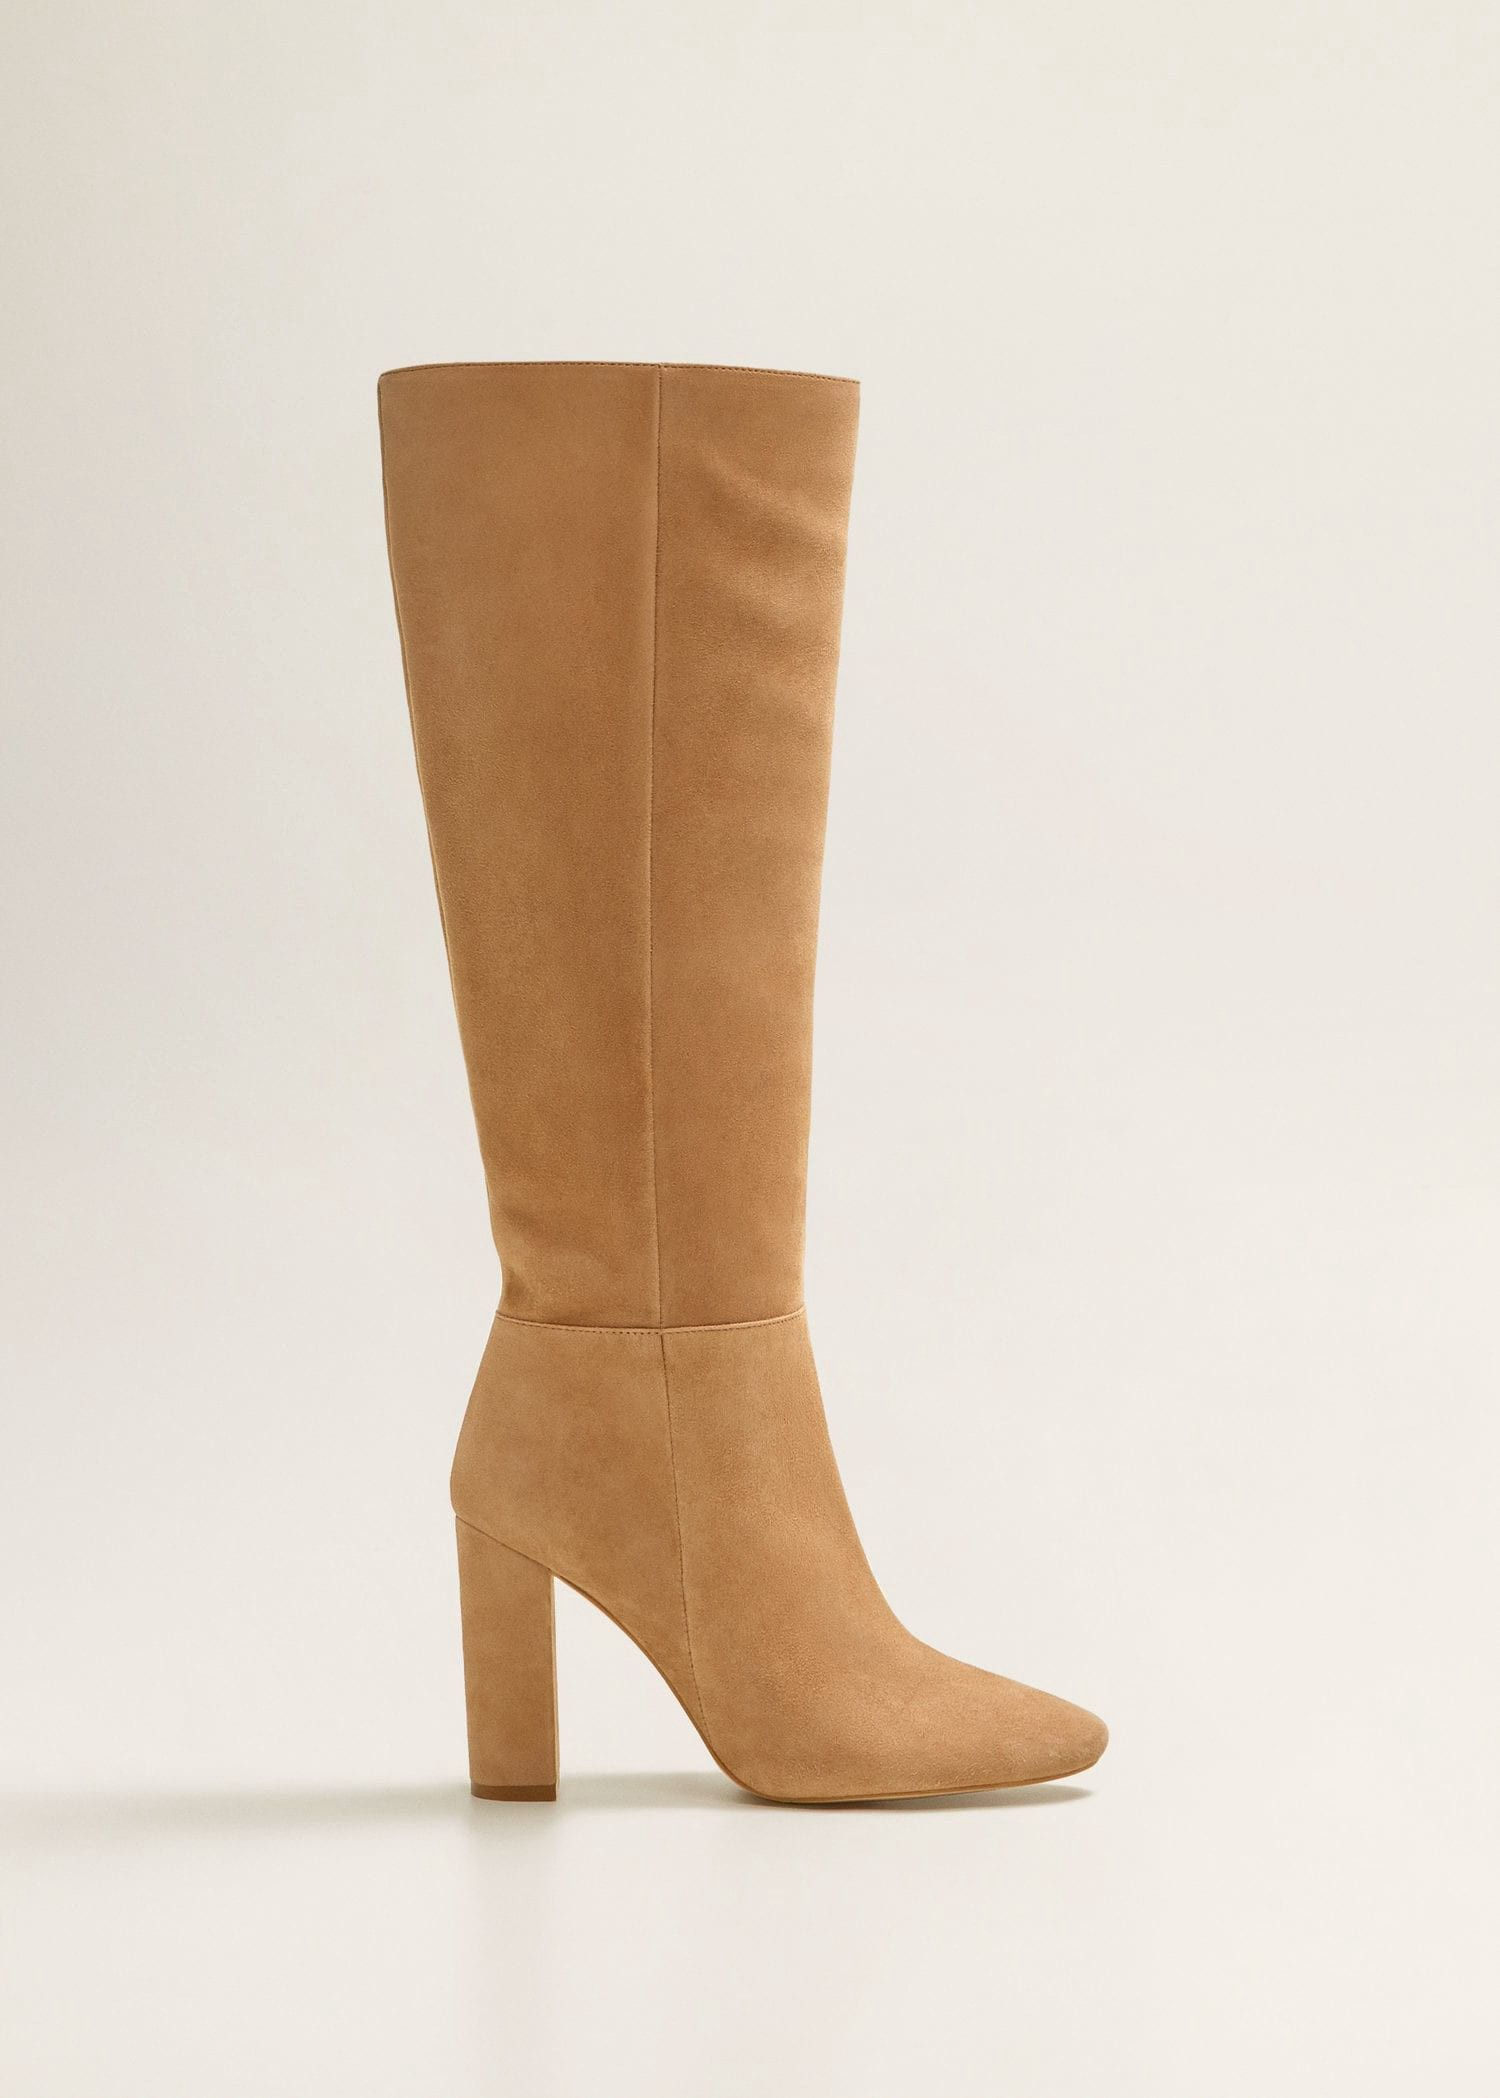 1819cb62cbd Mango Leather High-Leg Boots - 6